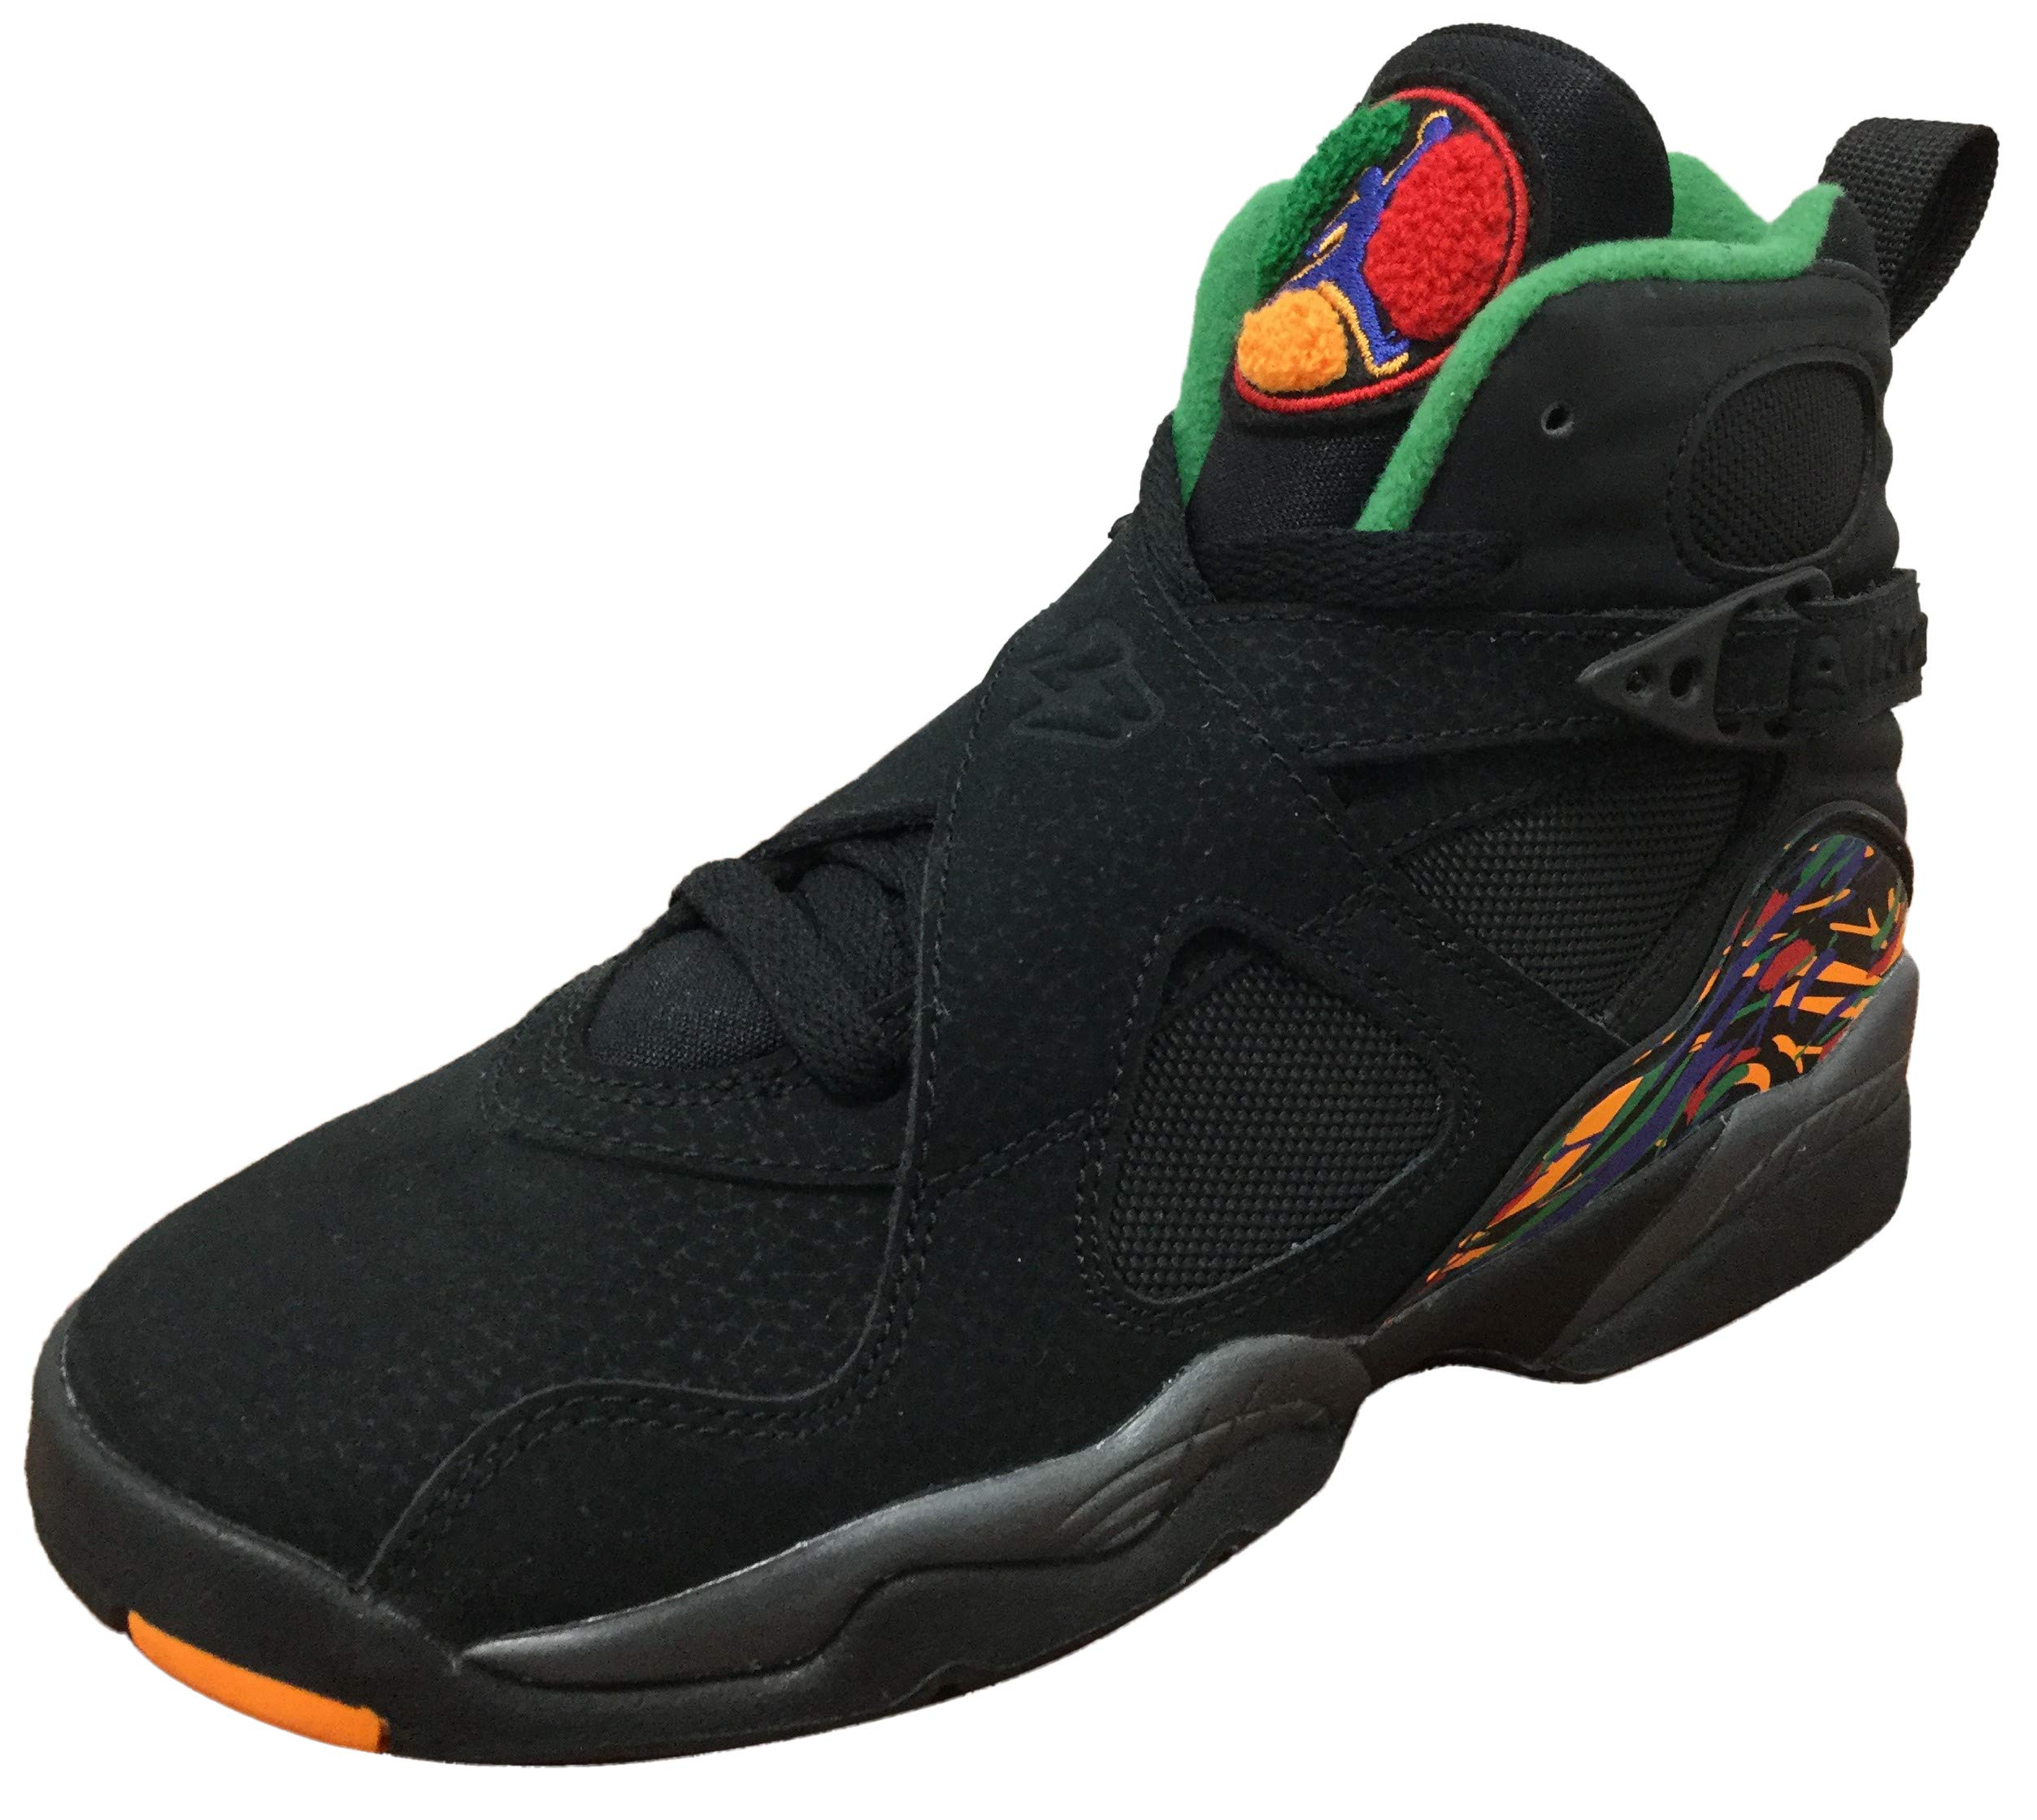 Air Jordan 8 Retro Big Kids' Shoes Black/Light Concord/Aloe Verde 305368-004 (4 M US)